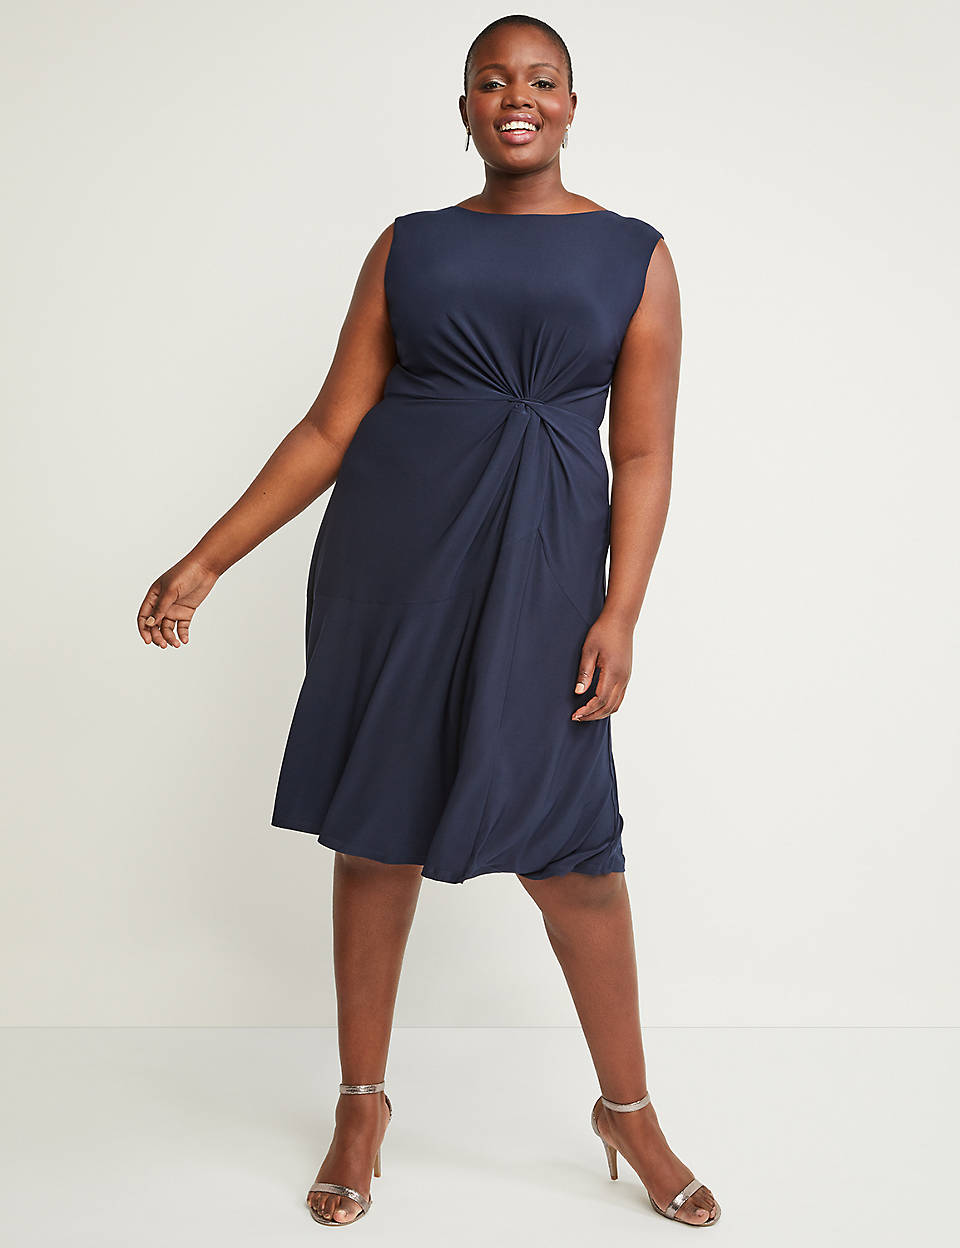 1b66cc7c8084 Side-Twist Fit & Flare Dress   Lane Bryant